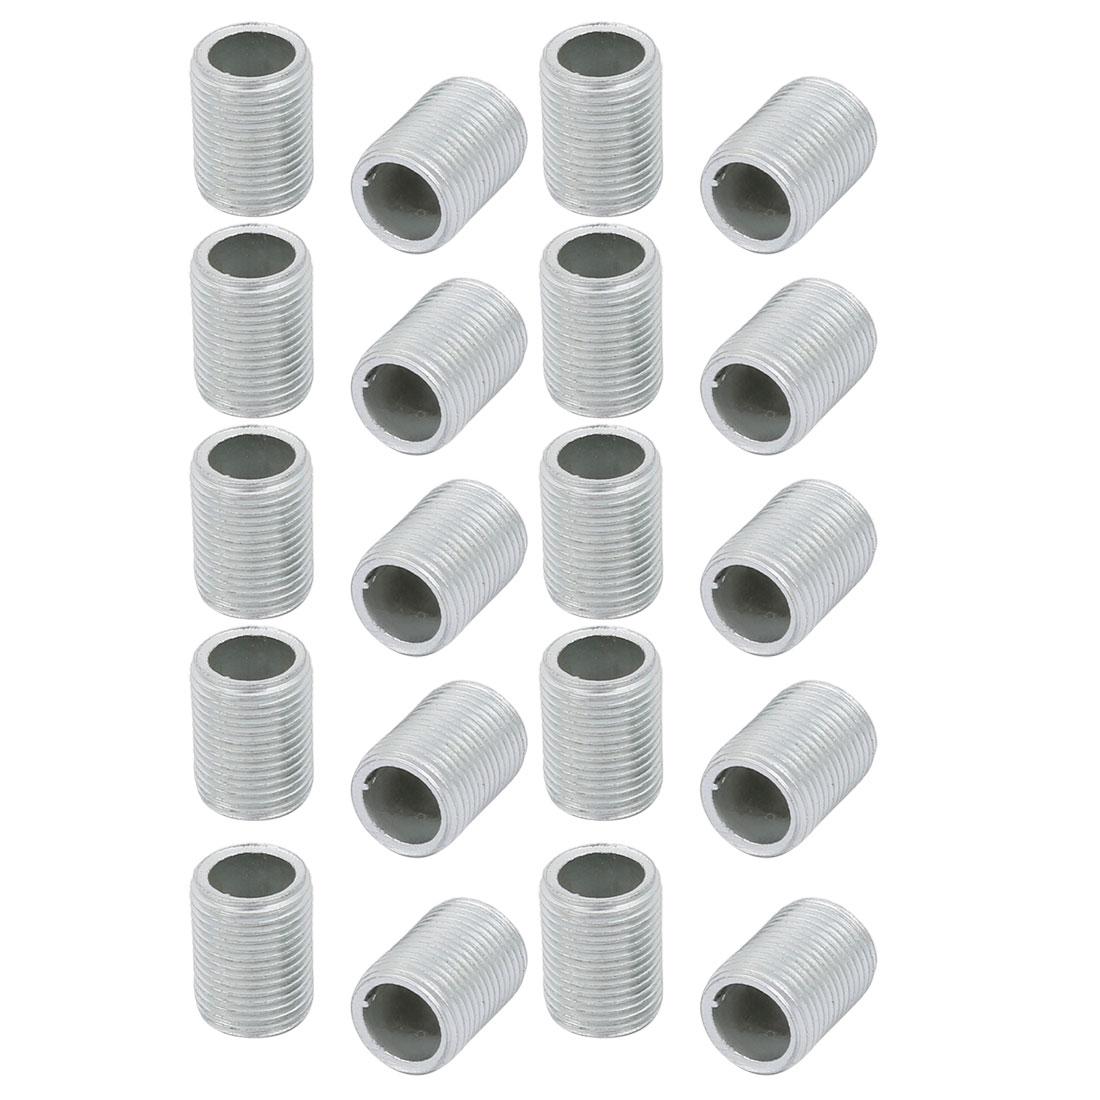 20 Pcs Metric M12 1mm Pitch Thread Zinc Plated Pipe Nipple Lamp Parts 15mm Long